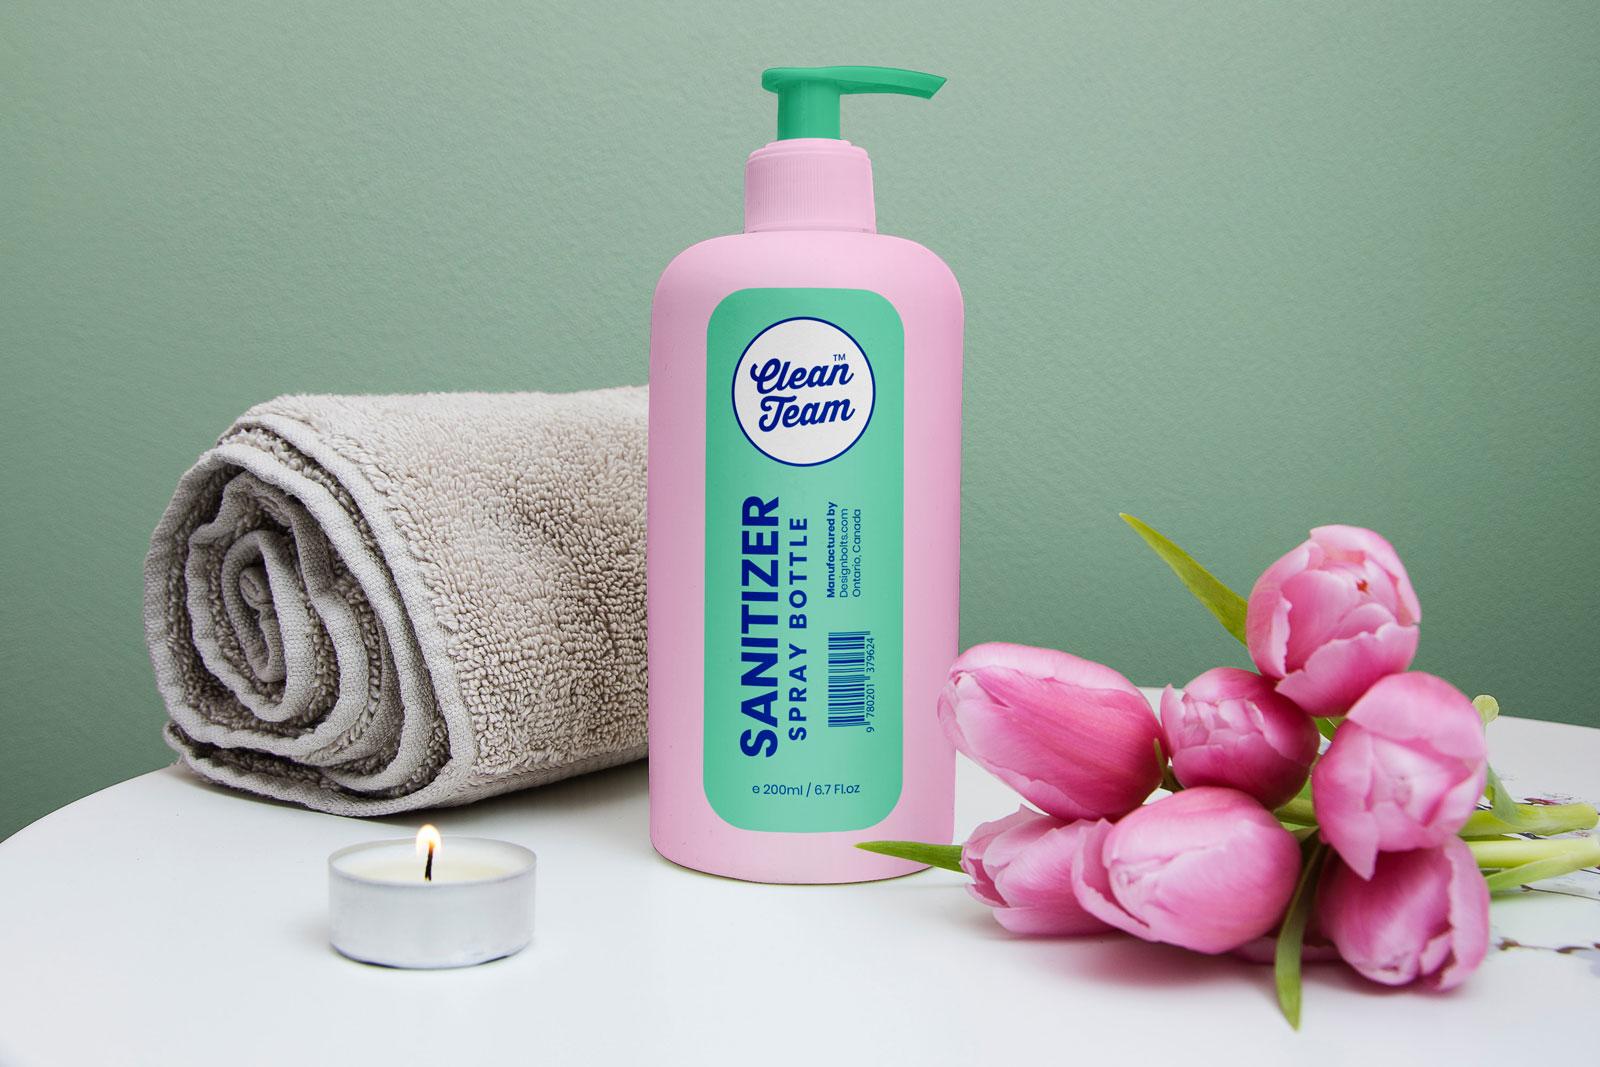 Free-Hand-Sanitizer-Spray-Bottle-Mockup-PSD